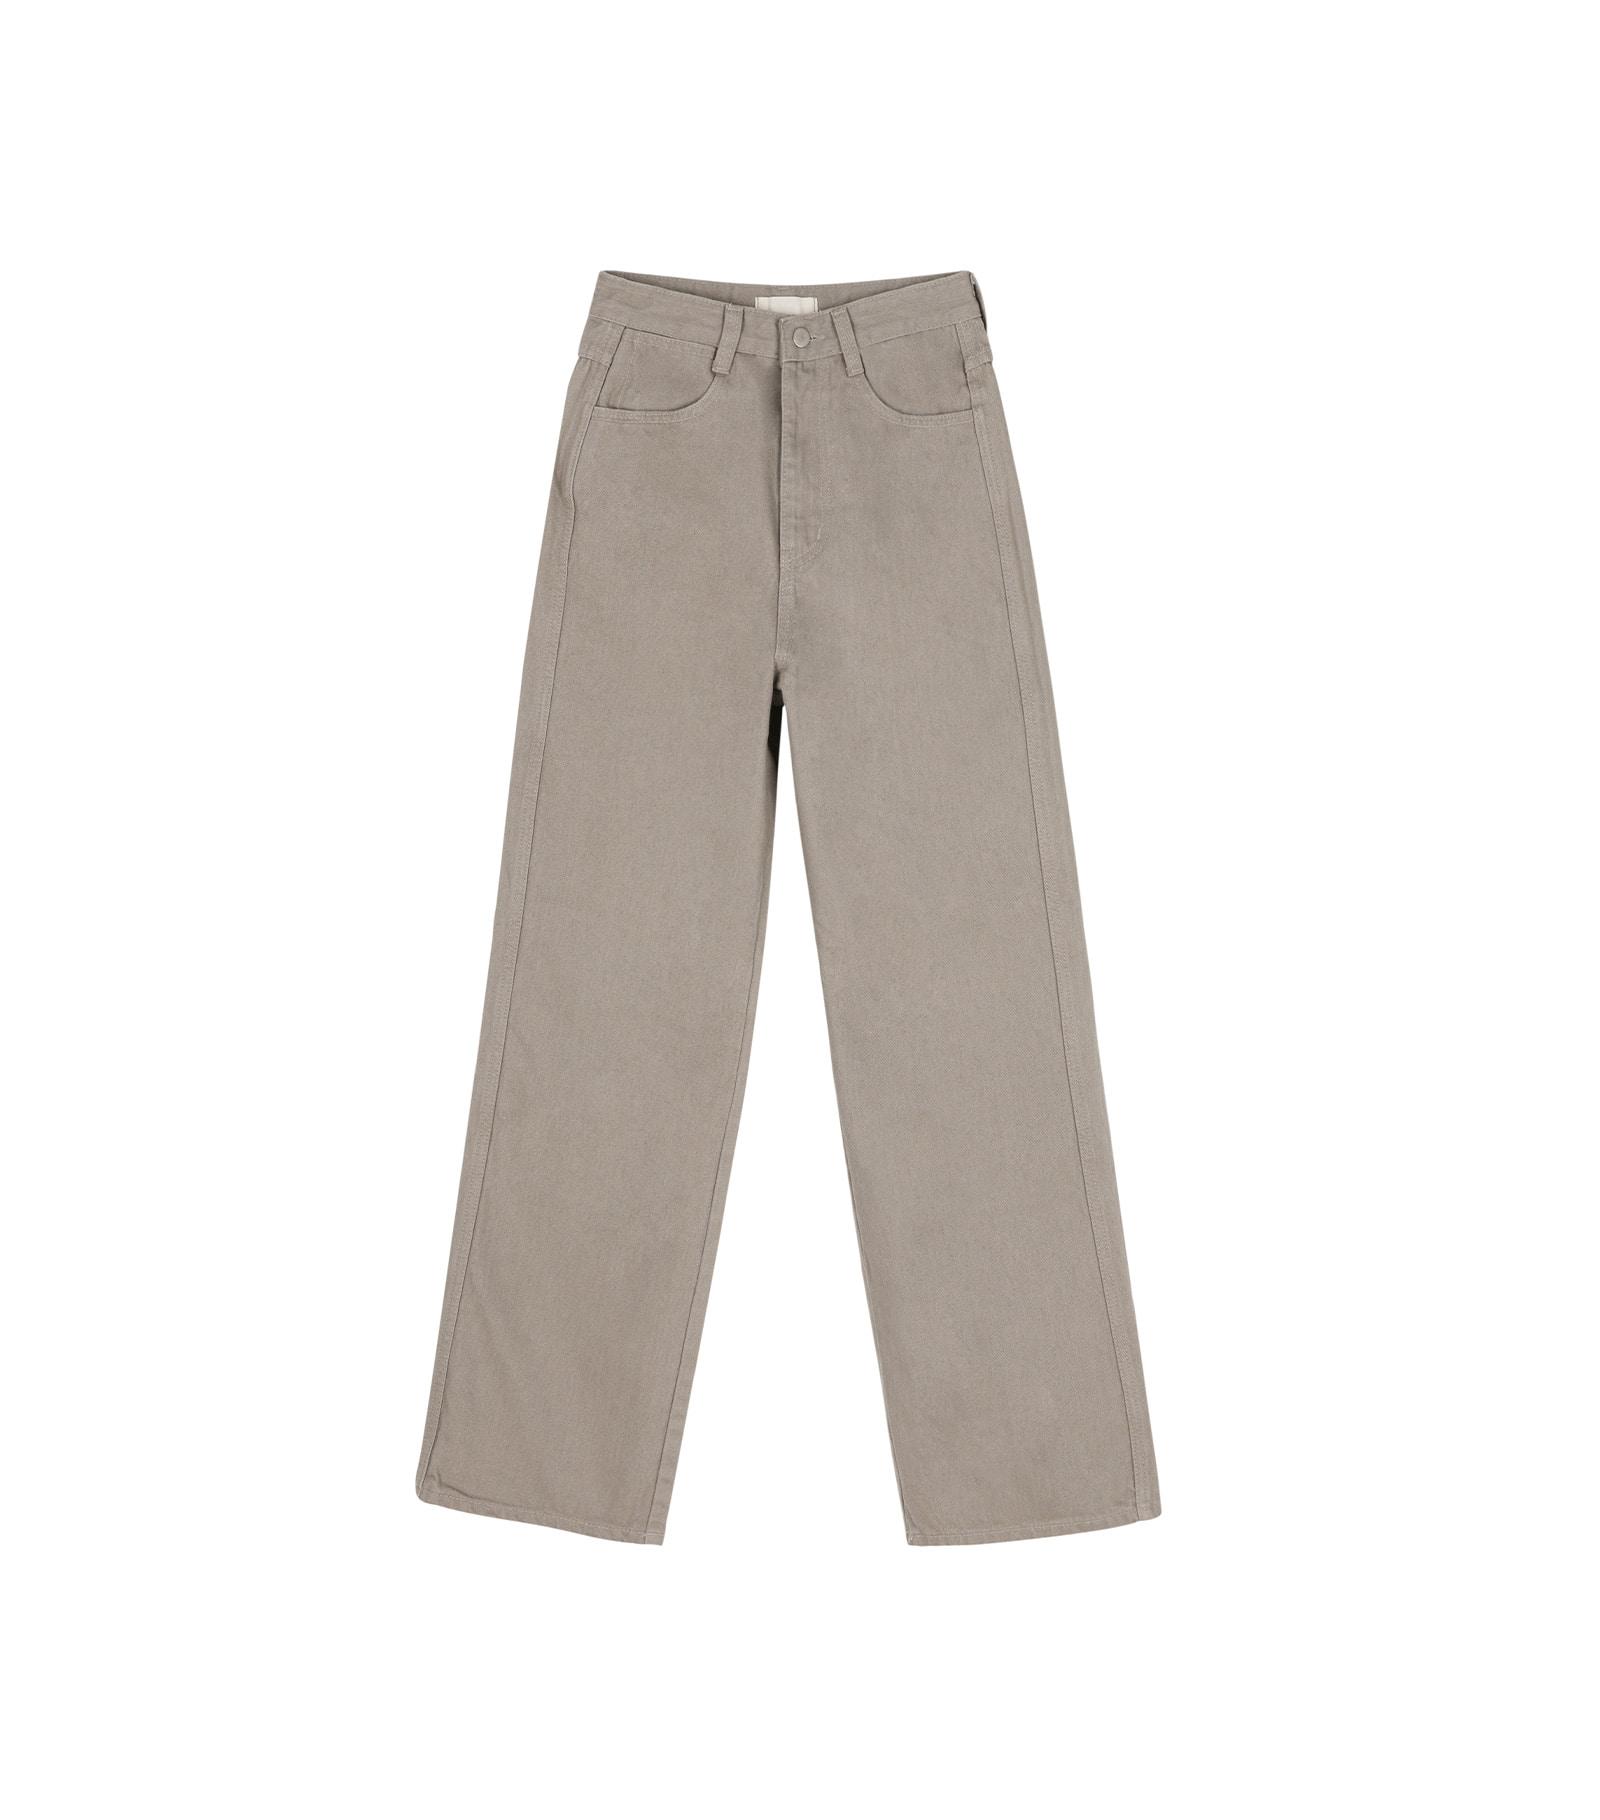 Kachi straight casual pants